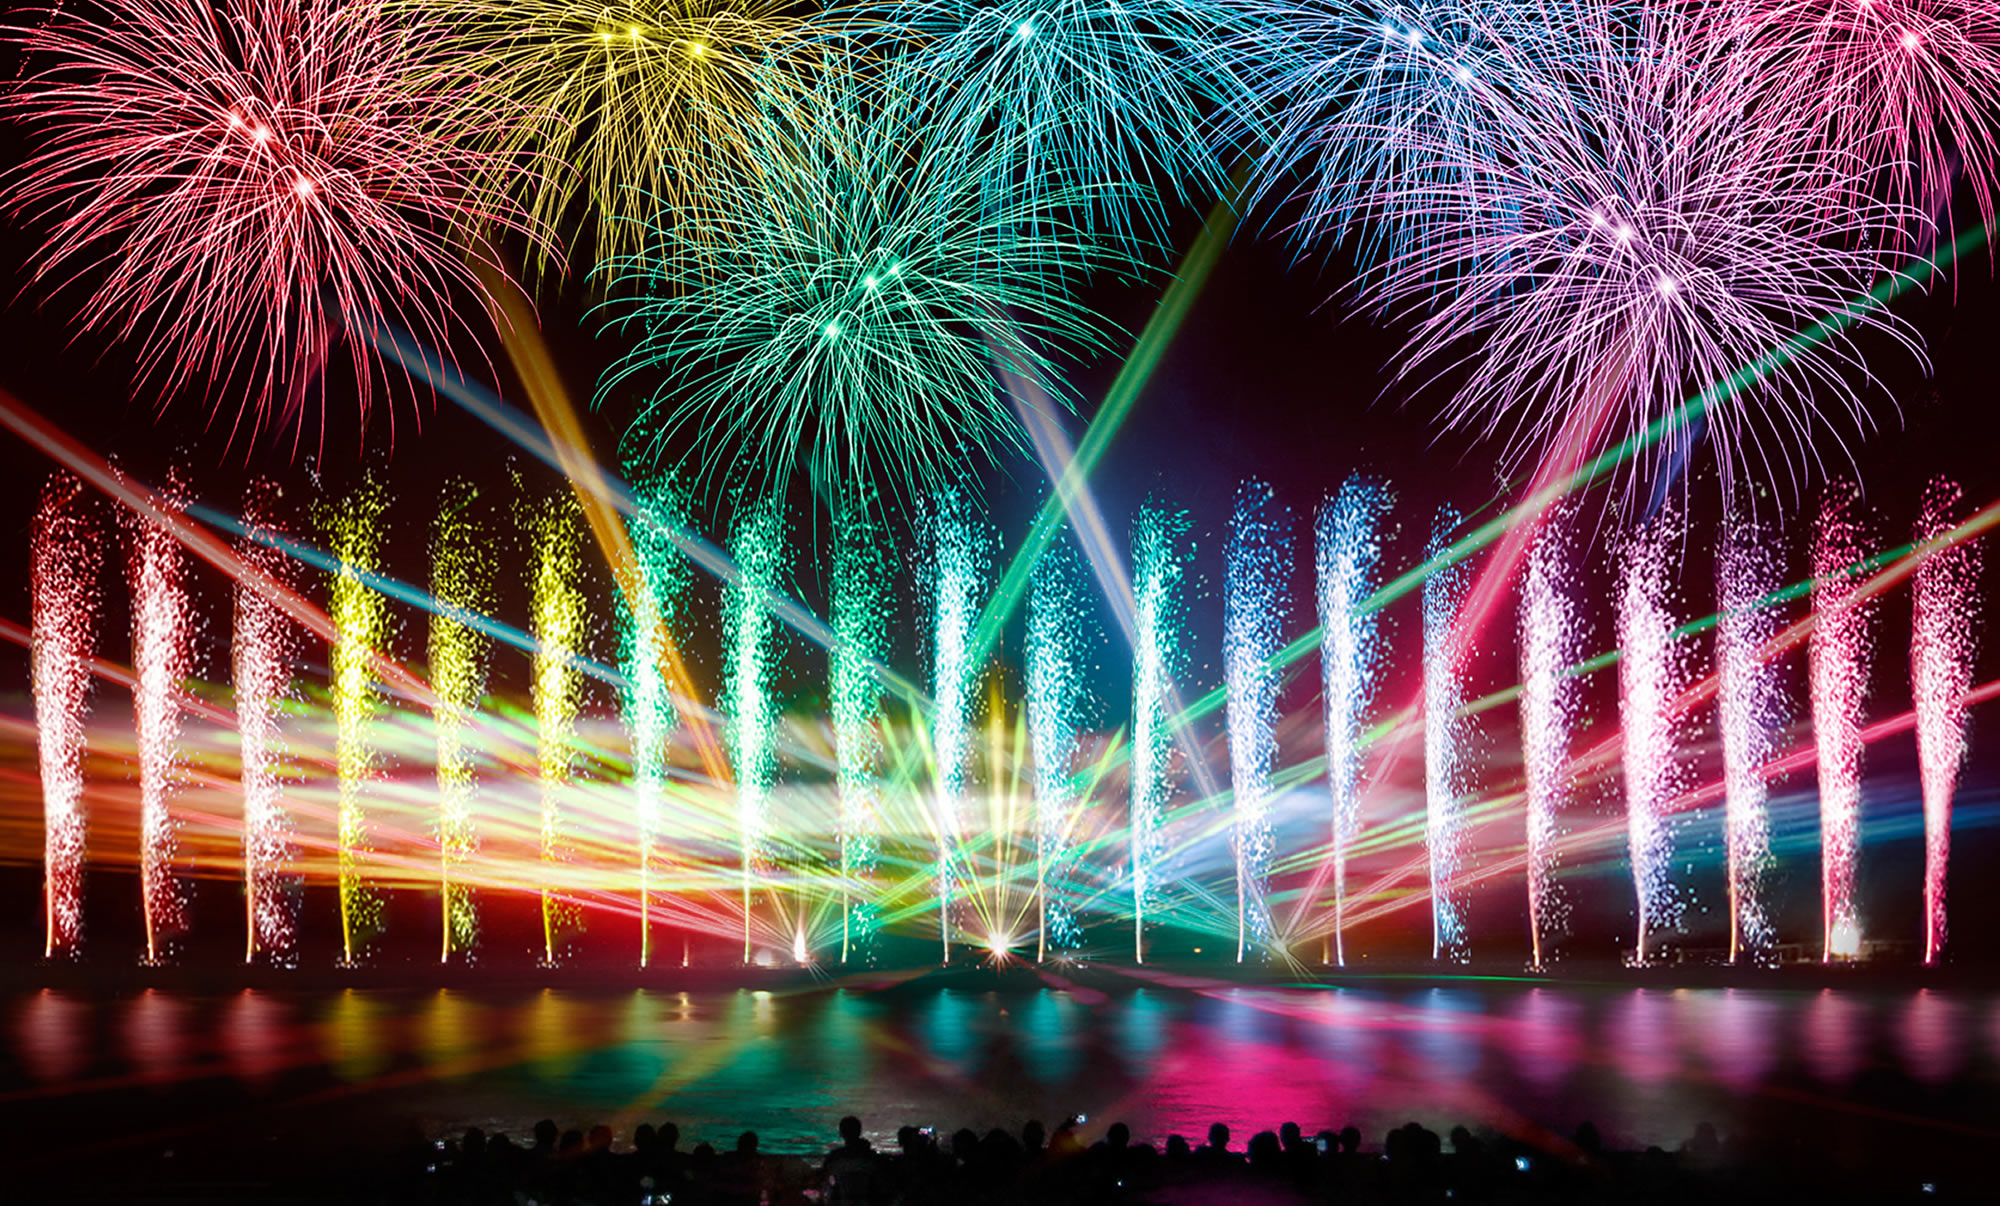 https://www.huistenbosch.co.jp/event/fireworks/rainbow/images/index/intro/main01_sp.jpg